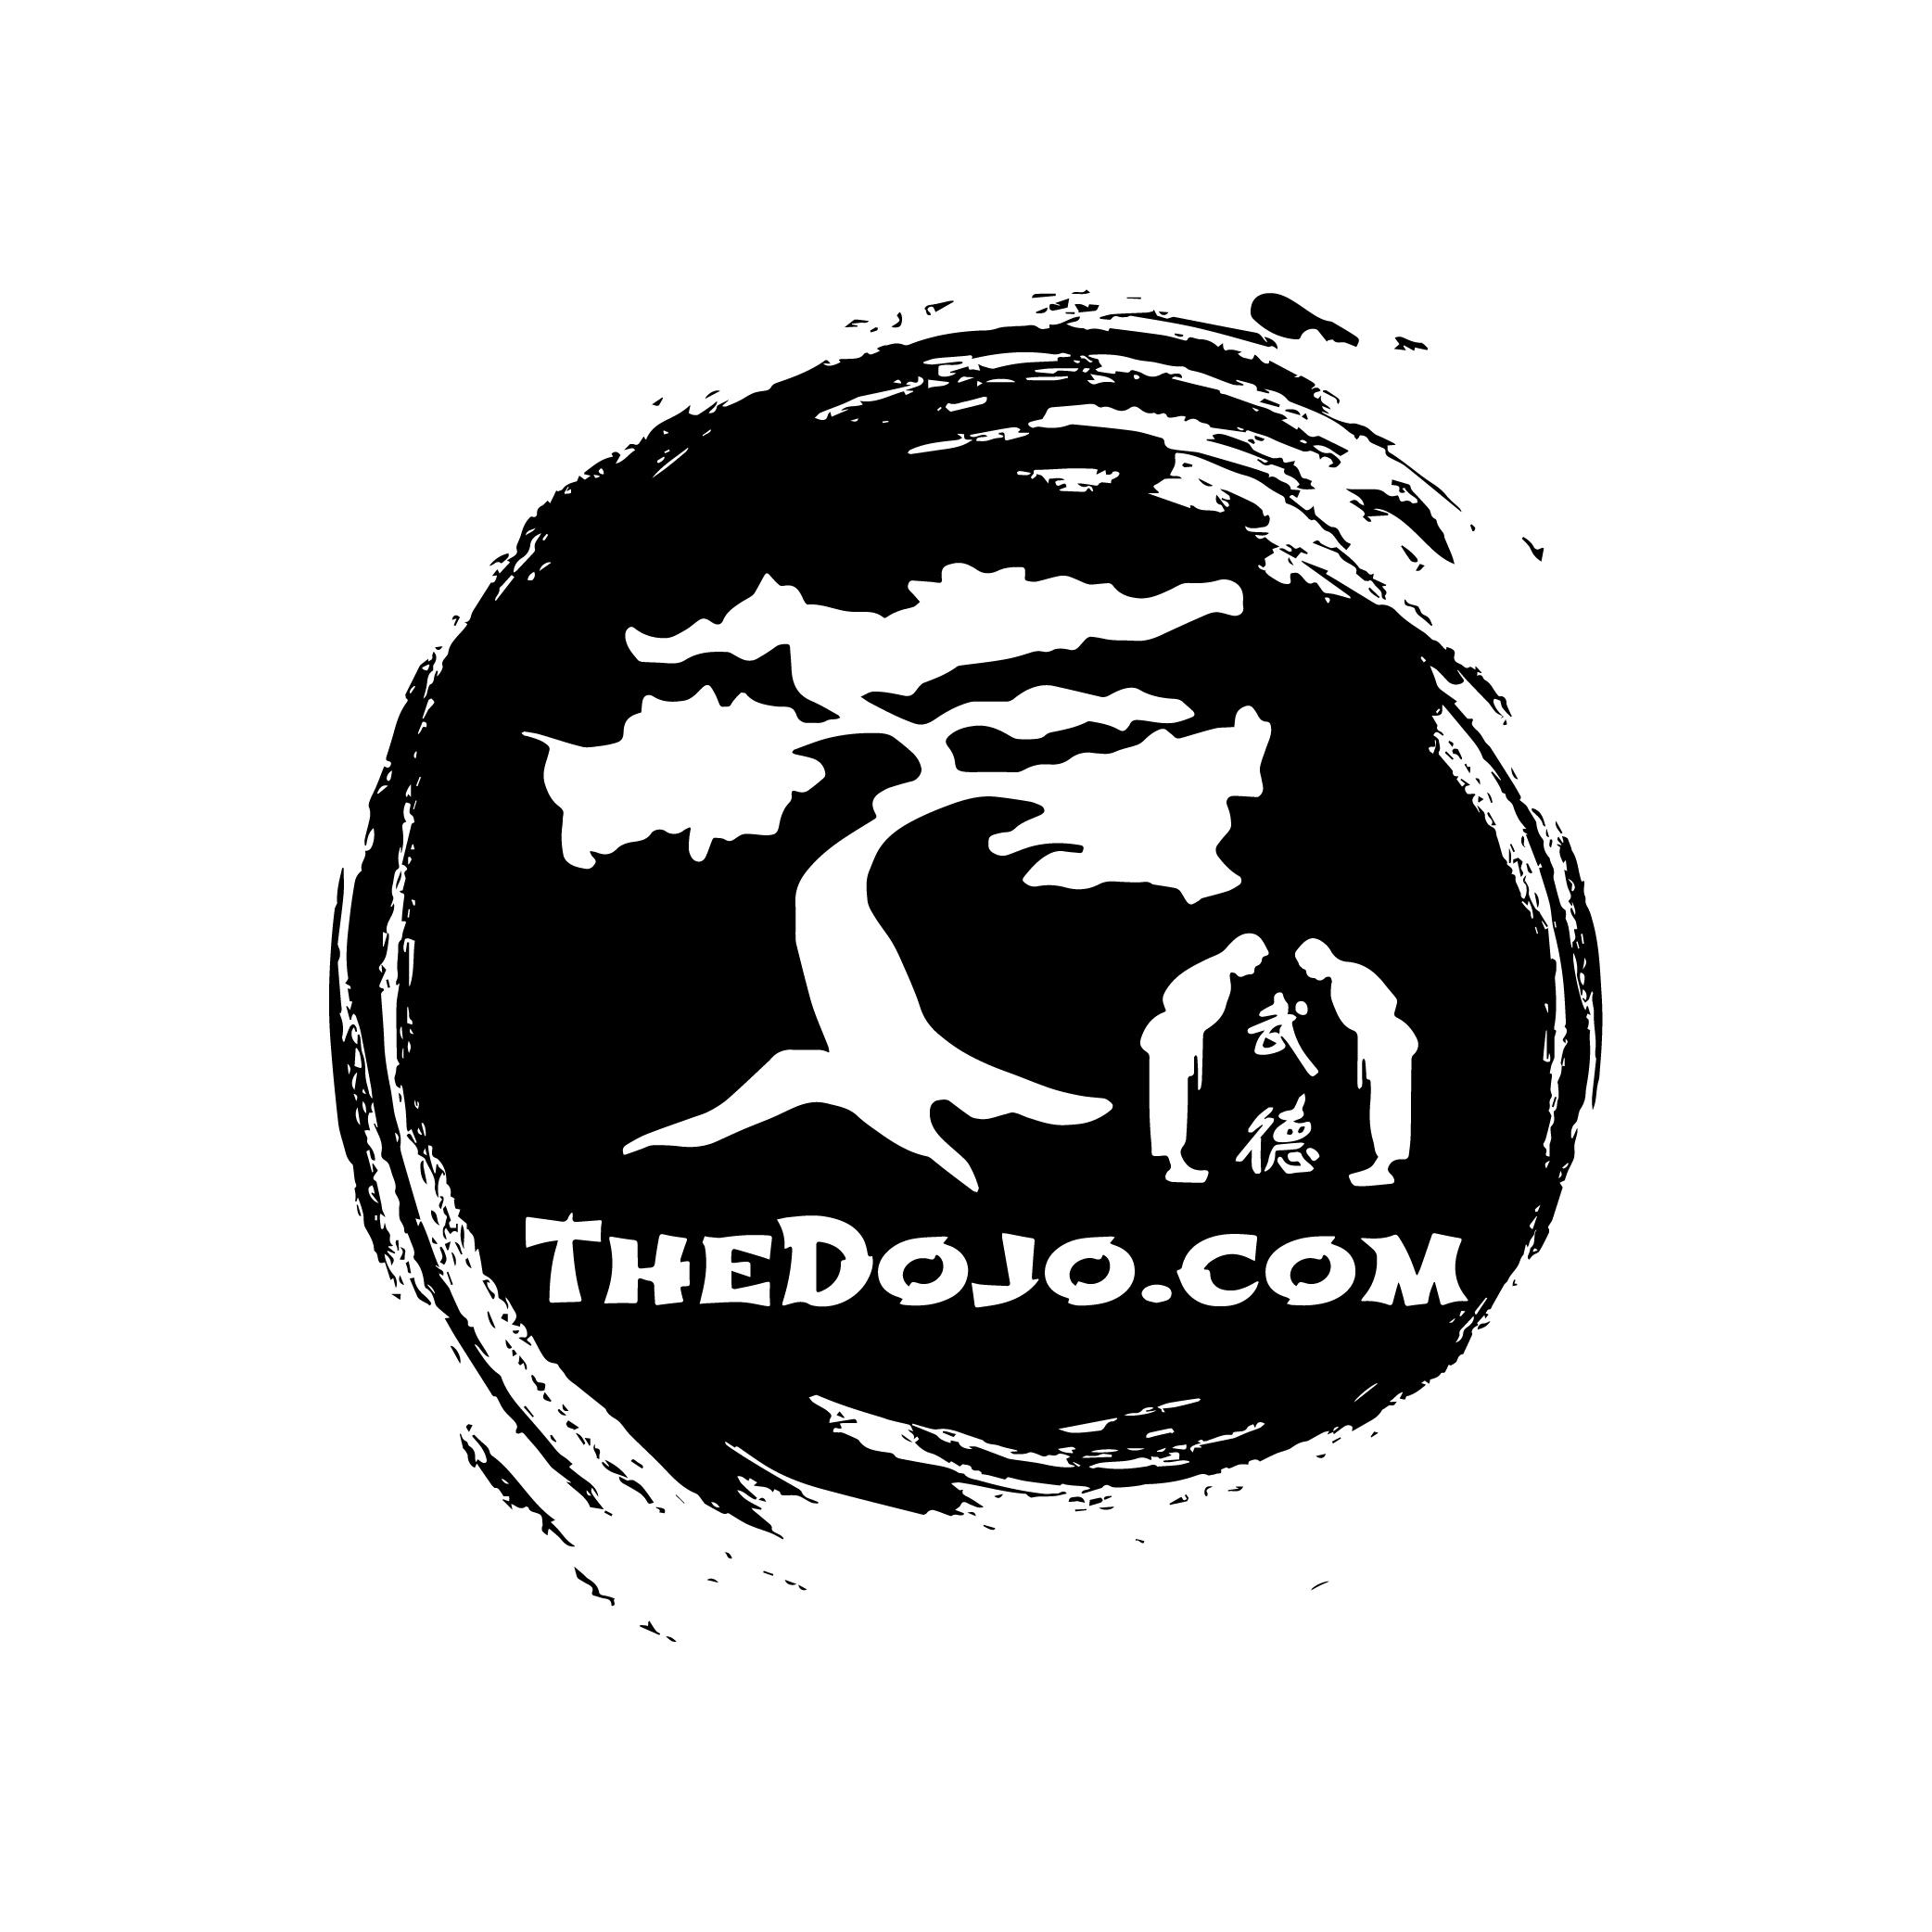 Thedojo.com